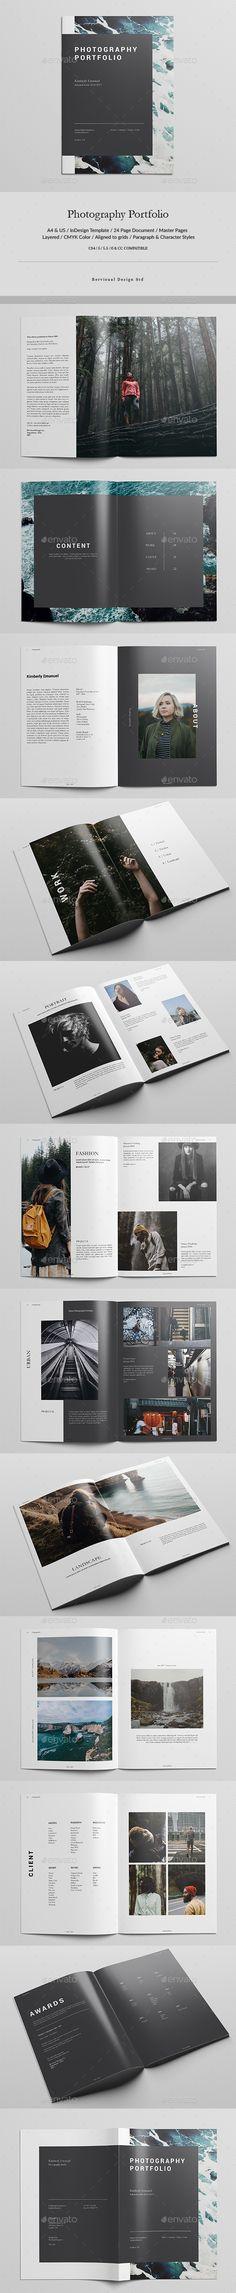 Photography Portfolio — InDesign INDD #editorial design #us letter • Download ➝ https://graphicriver.net/item/photography-portfolio/19746744?ref=pxcr